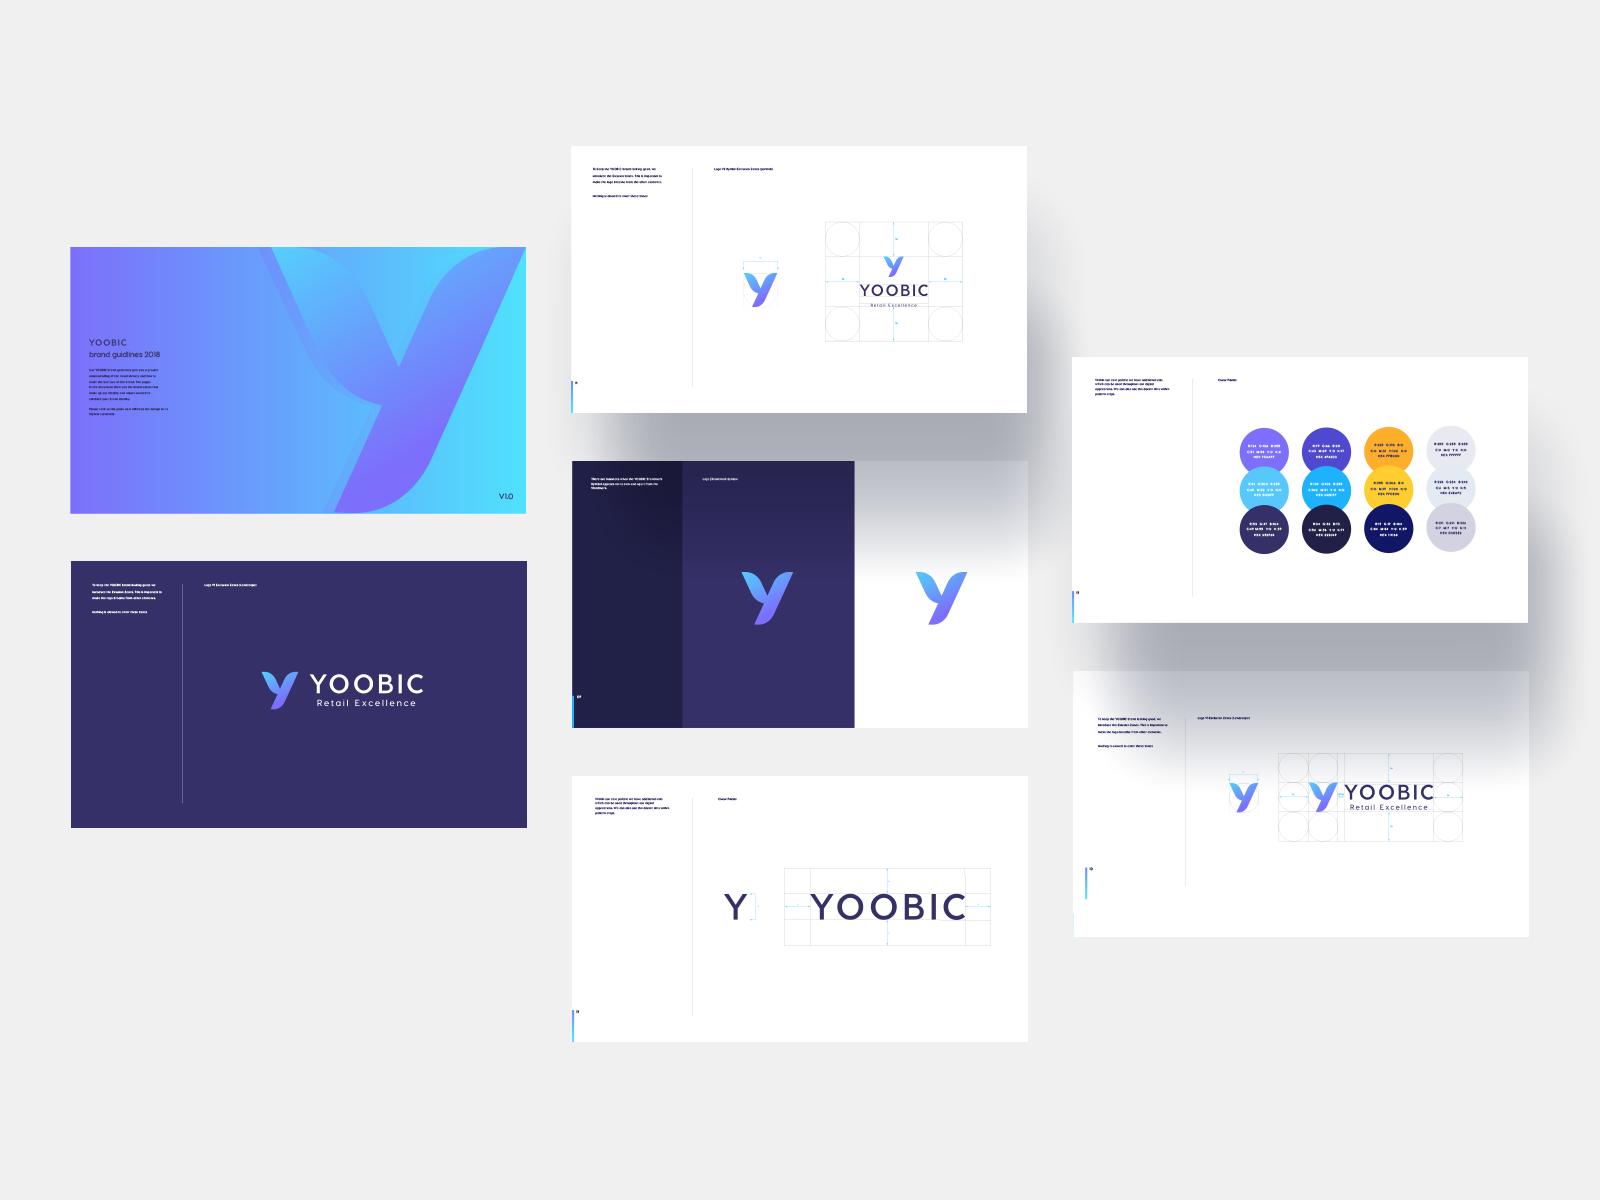 Yoobic brand book v1.0.3